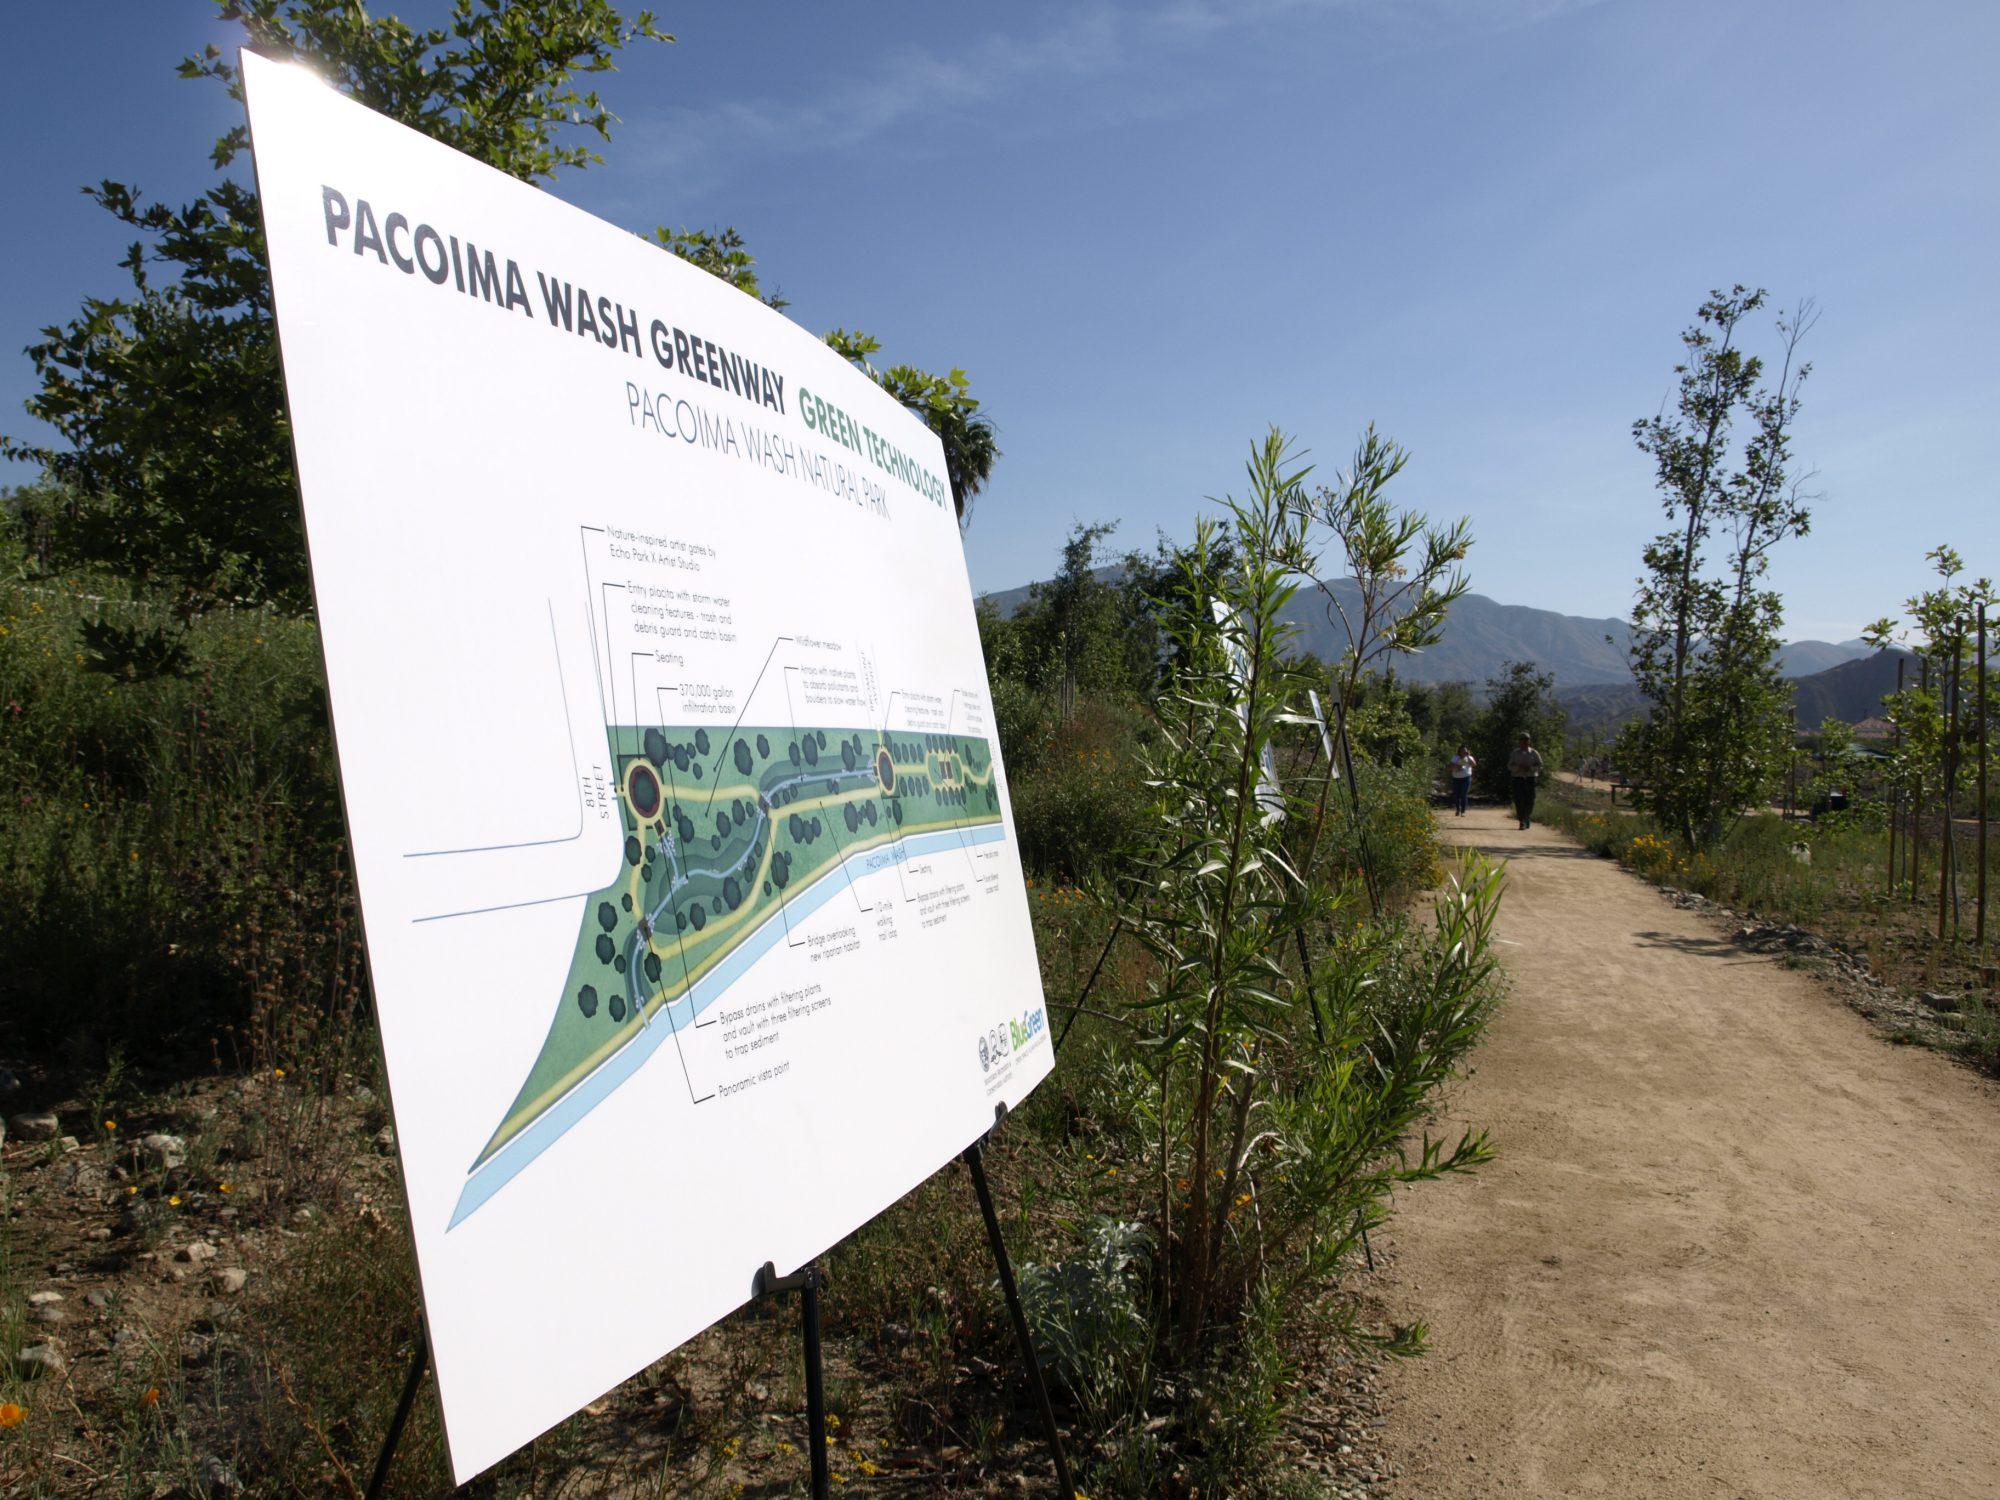 Pacoima Wash Natural Park: Green Technology/Park Map Board